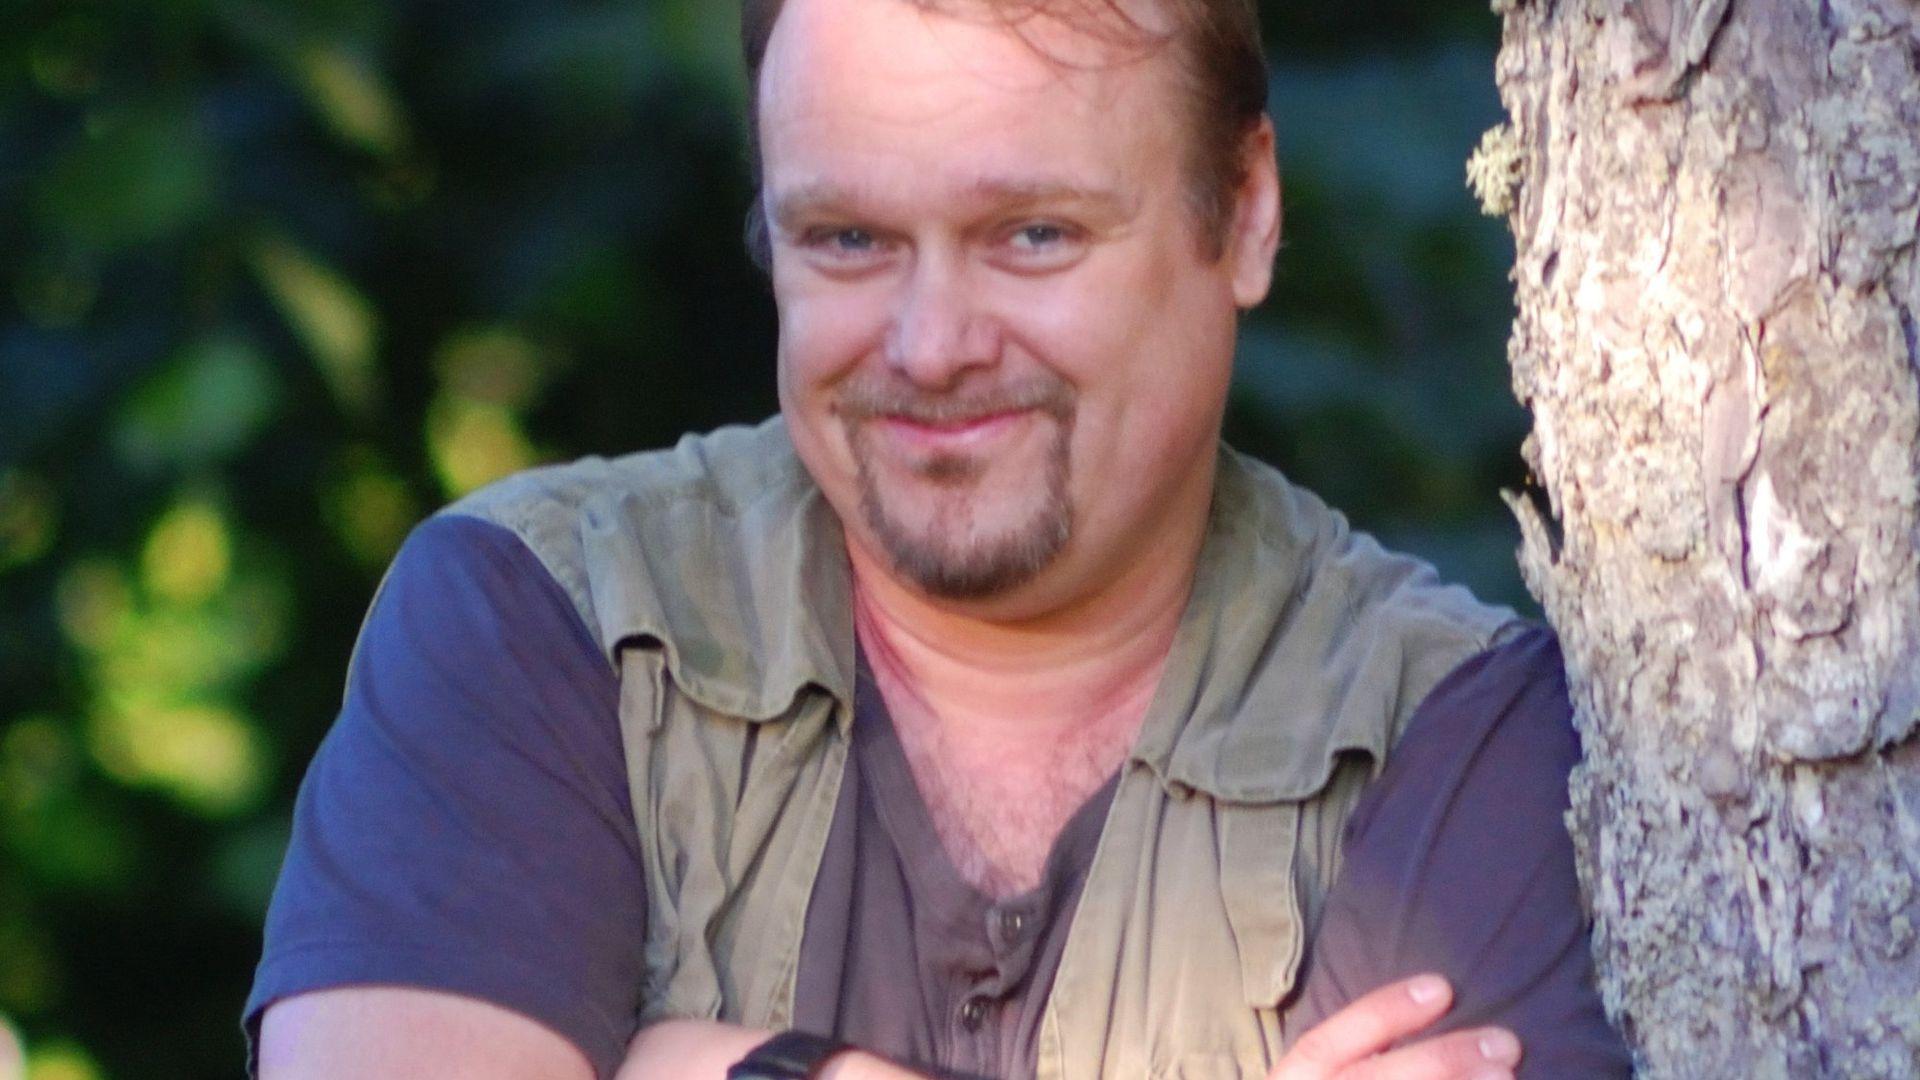 Profile hero image